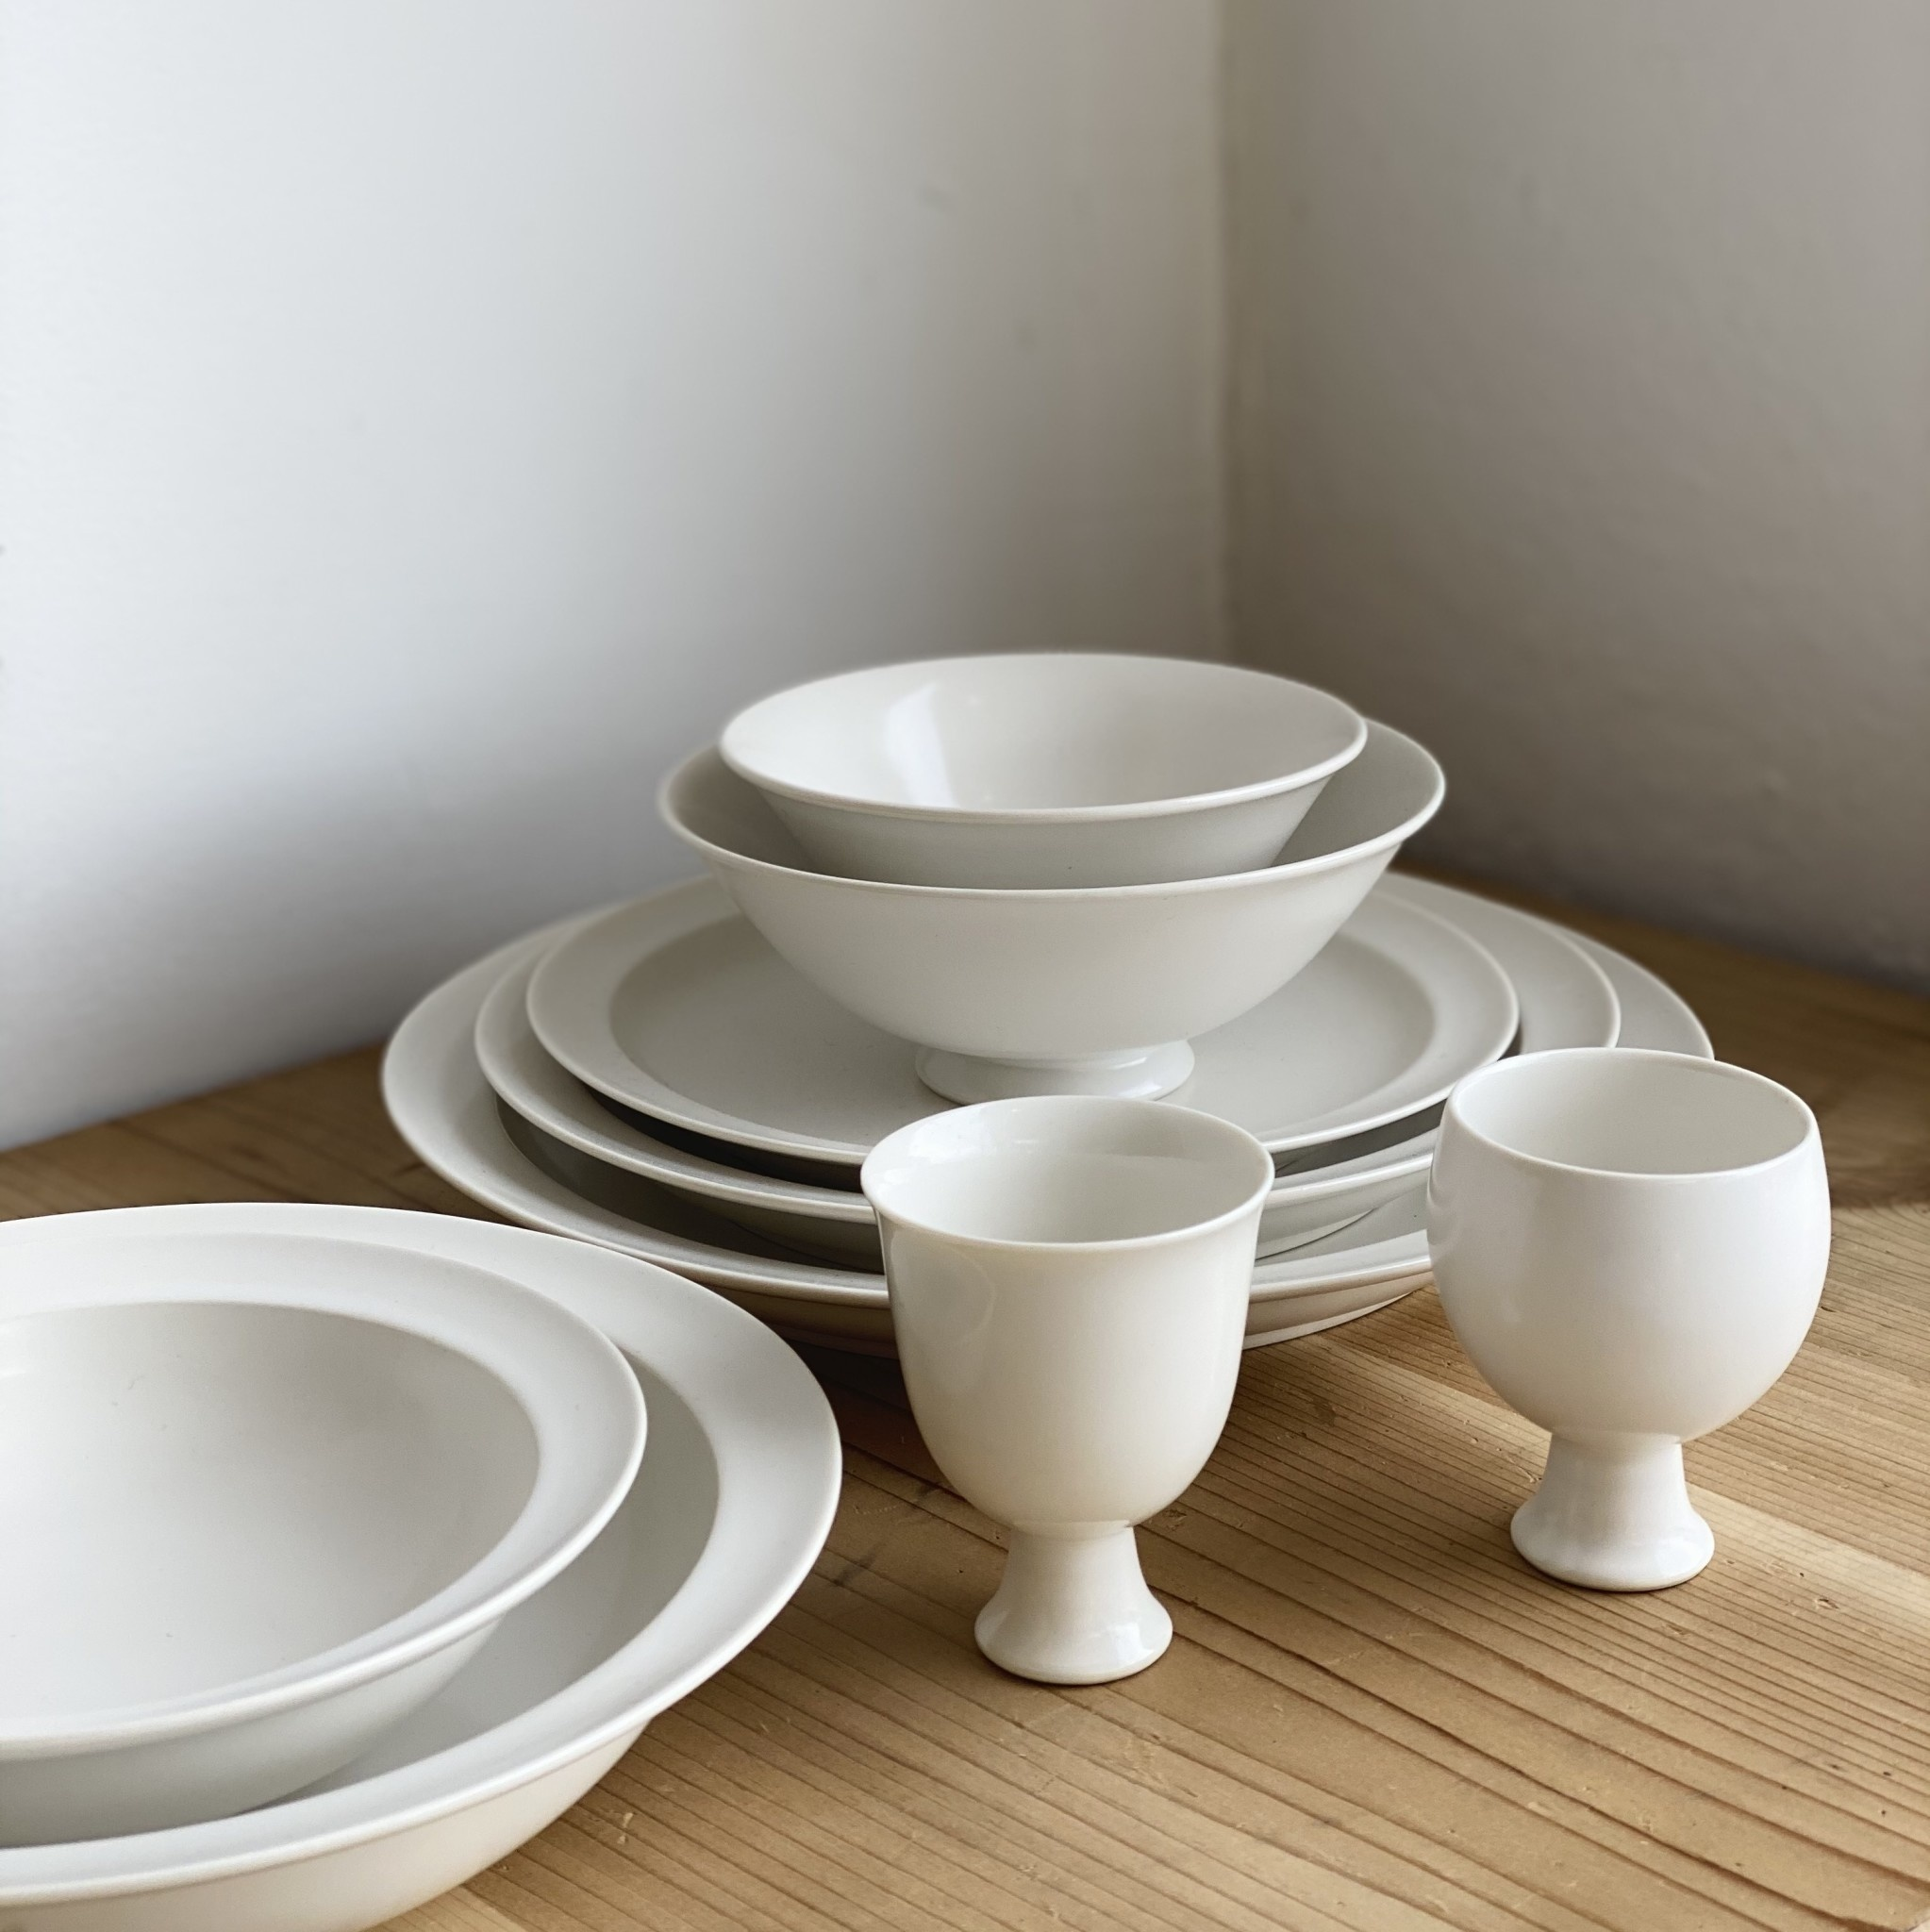 Jicon Porcelain Pedestal Vessel - Round Cup - 2.75 in